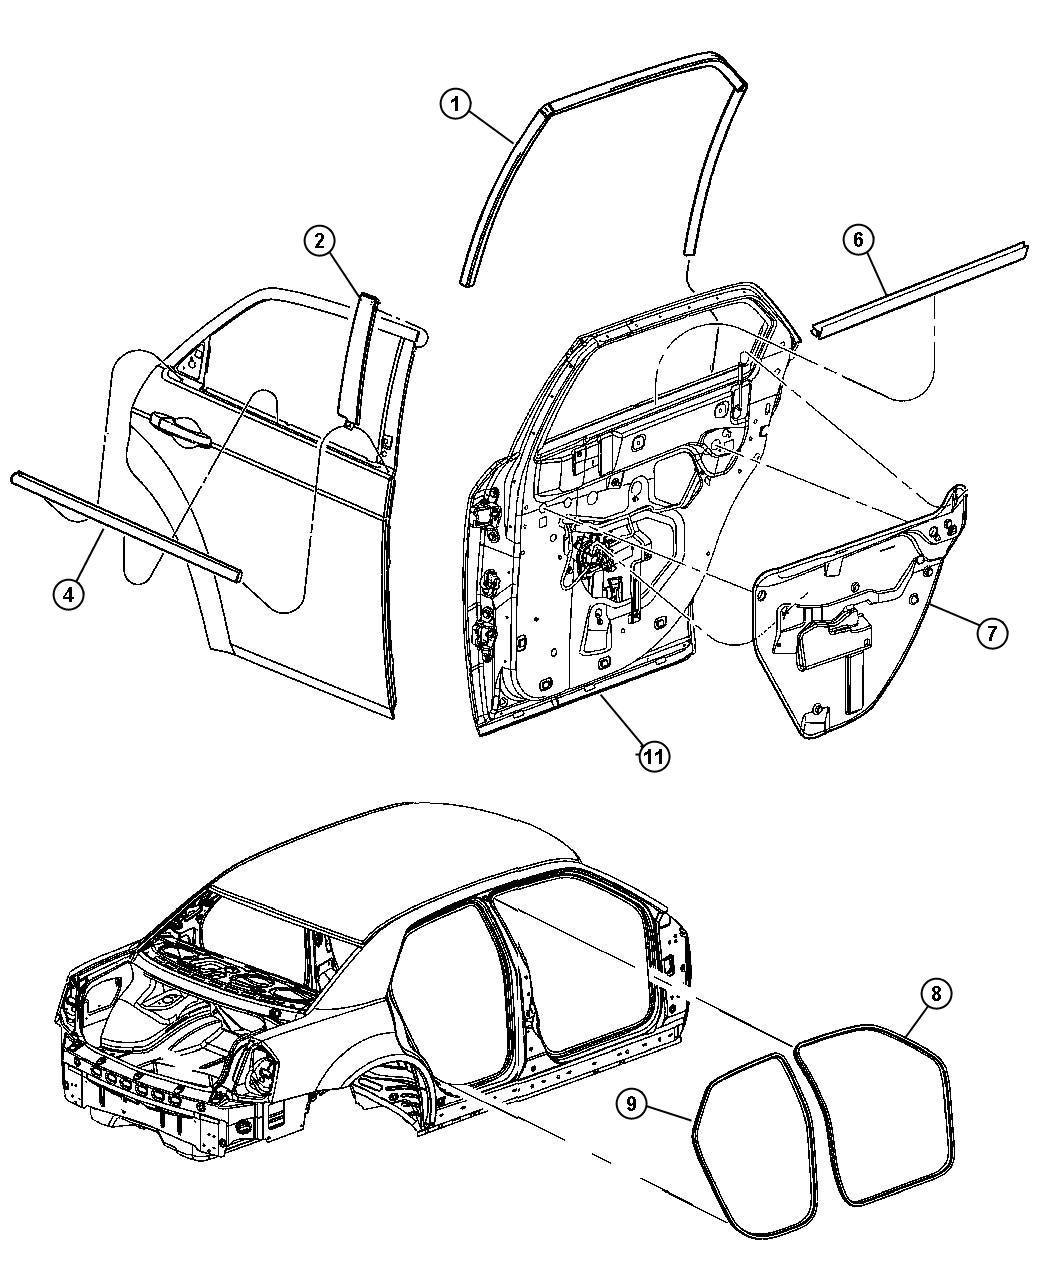 2007 Dodge Magnum R  T 5 7l Hemi V8 Weatherstrip  Rear Door